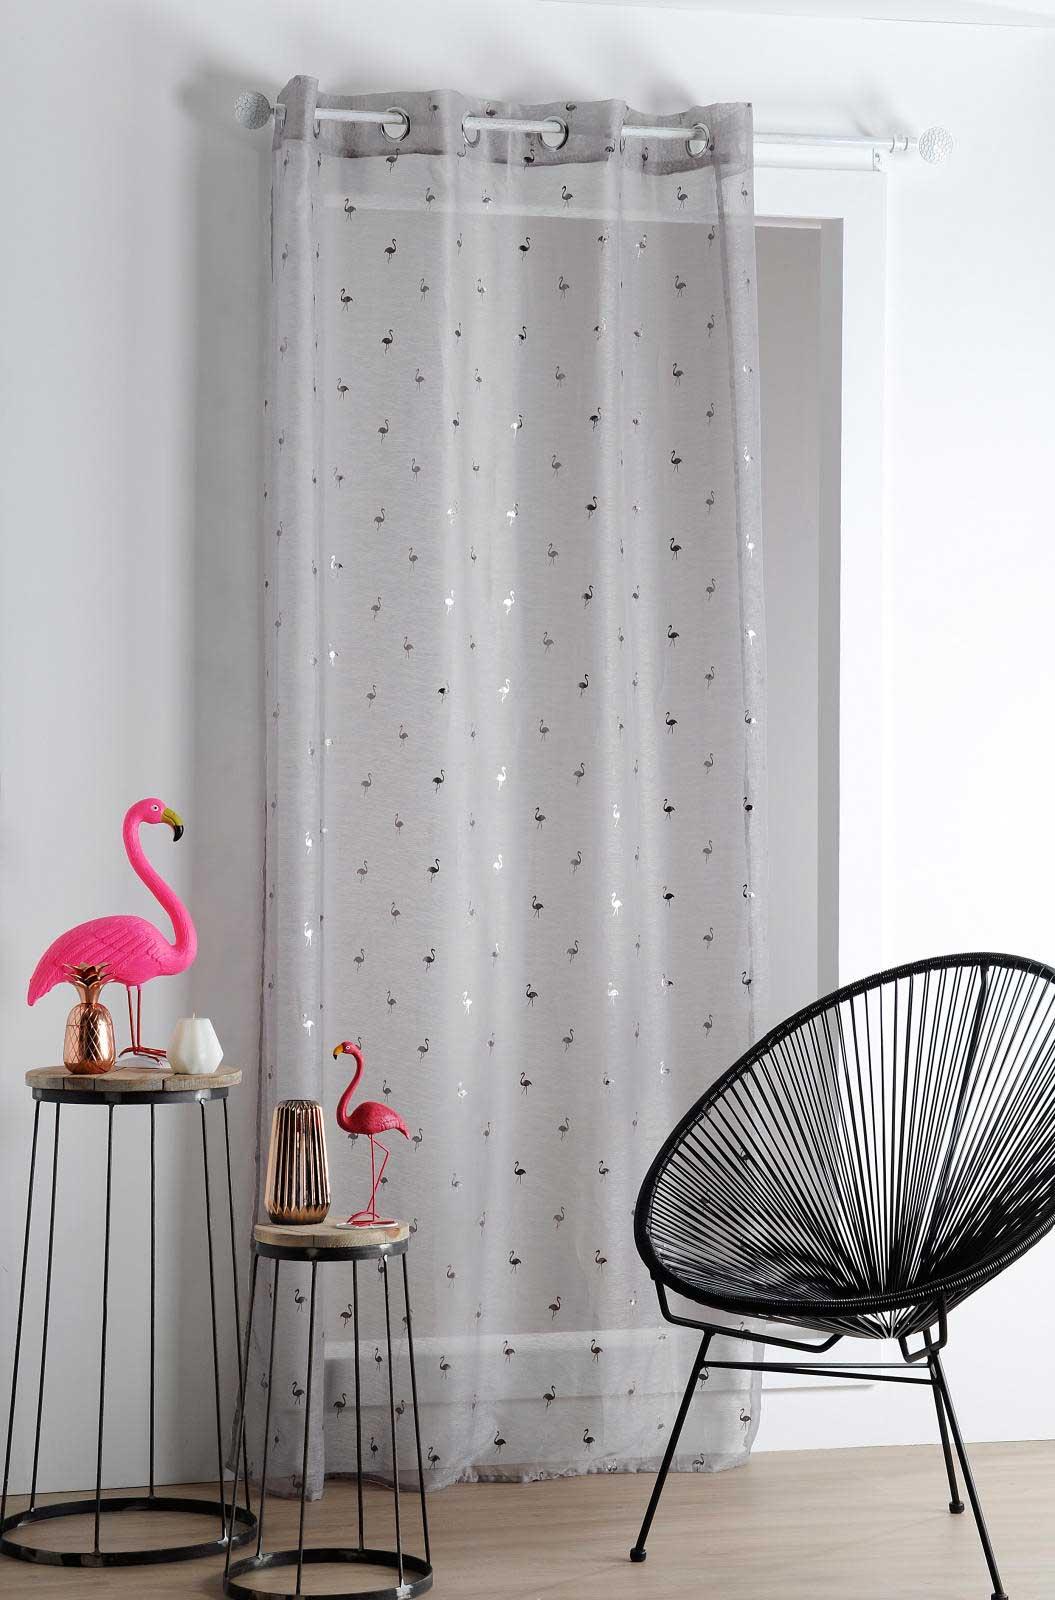 voilage aux multiples flamants roses anthracite mastic blanc homemaison vente en. Black Bedroom Furniture Sets. Home Design Ideas